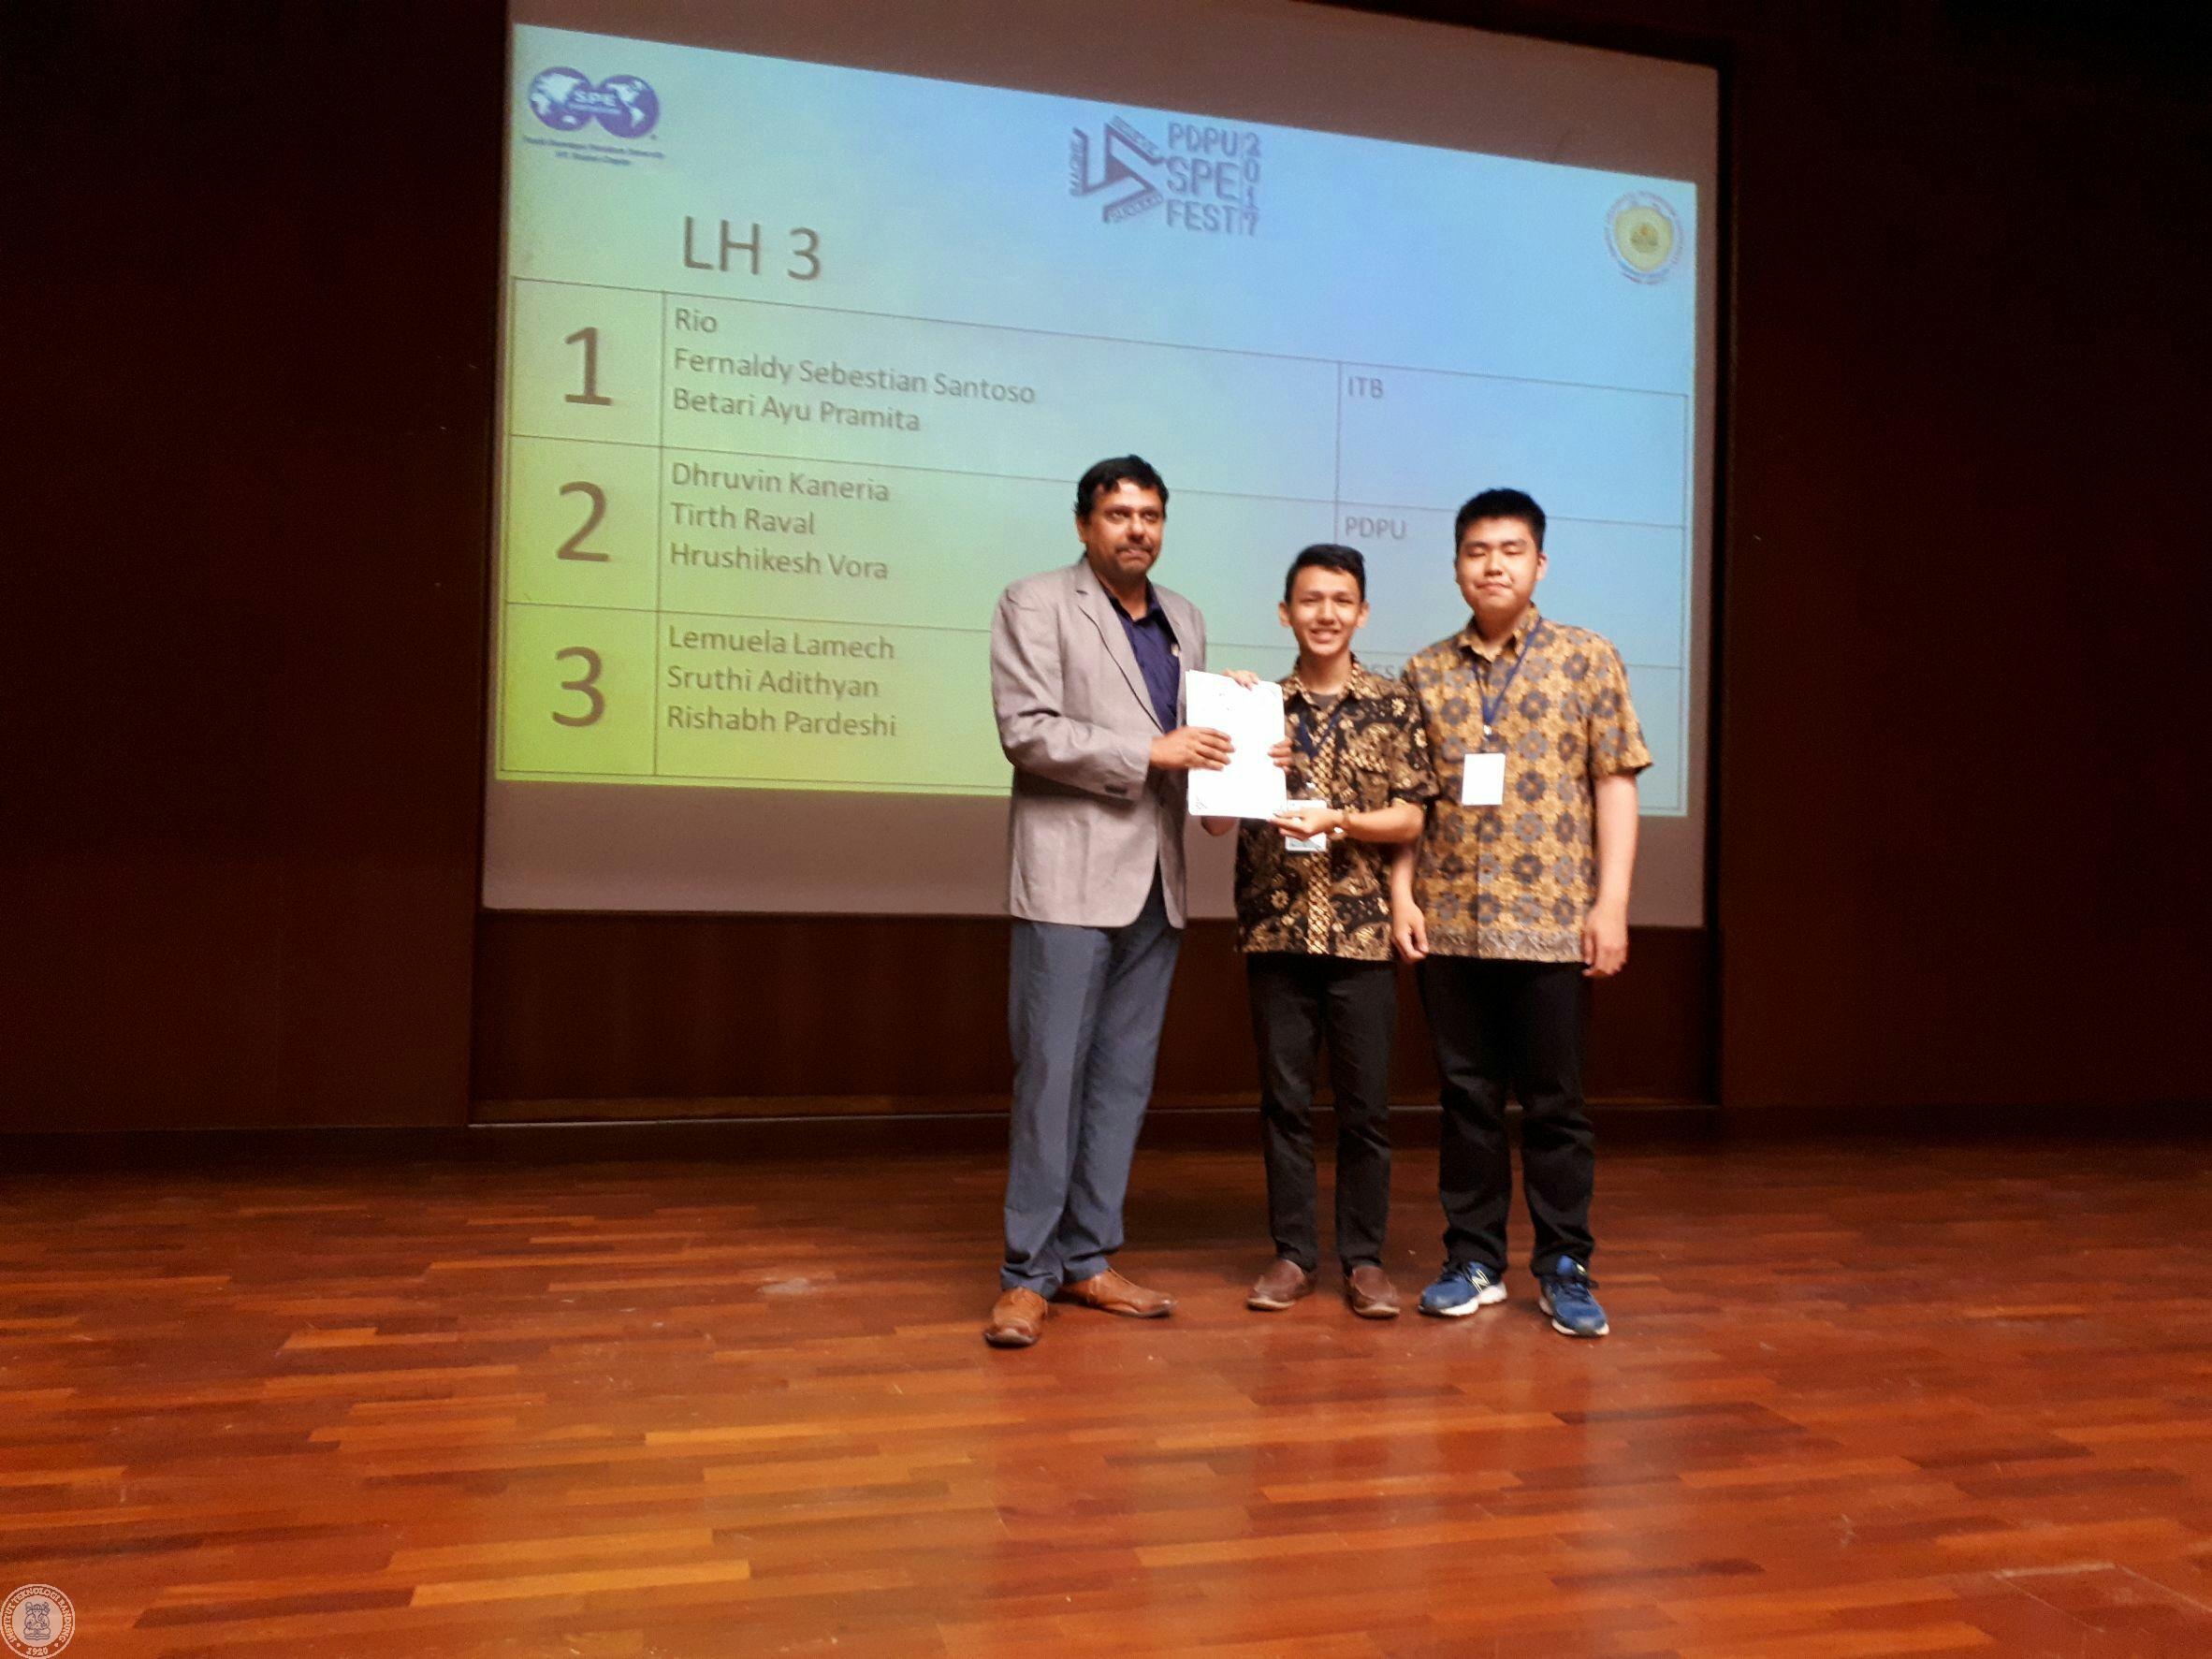 Mahasiswa Teknik Geologi ITB Juarai Perlombaan Tingkat Asia